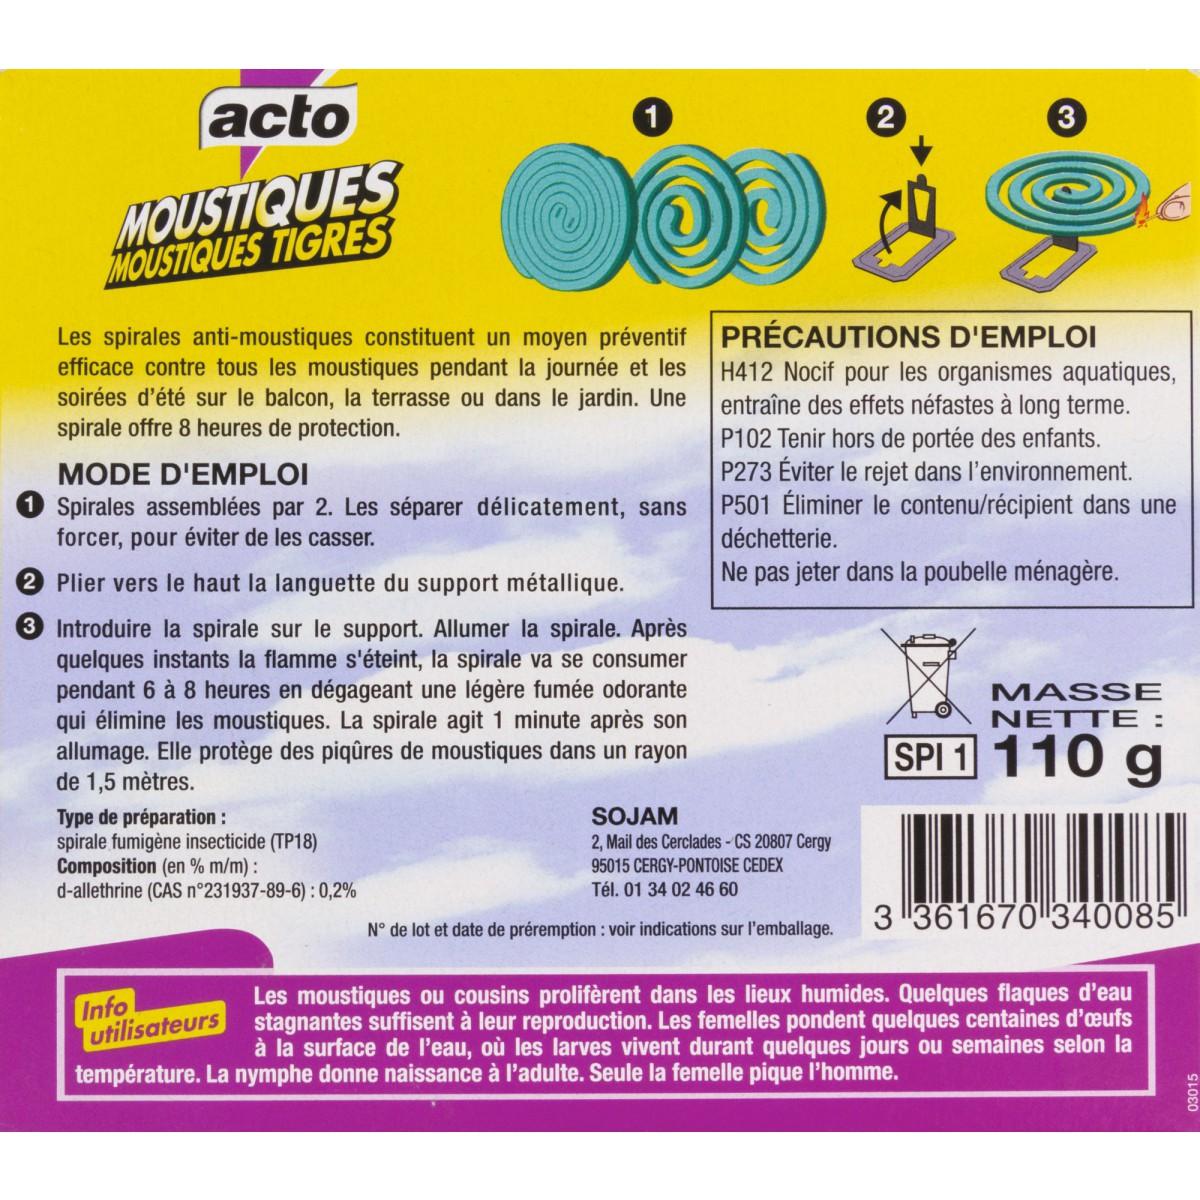 Moustiques spirale Acto - 10 spirales